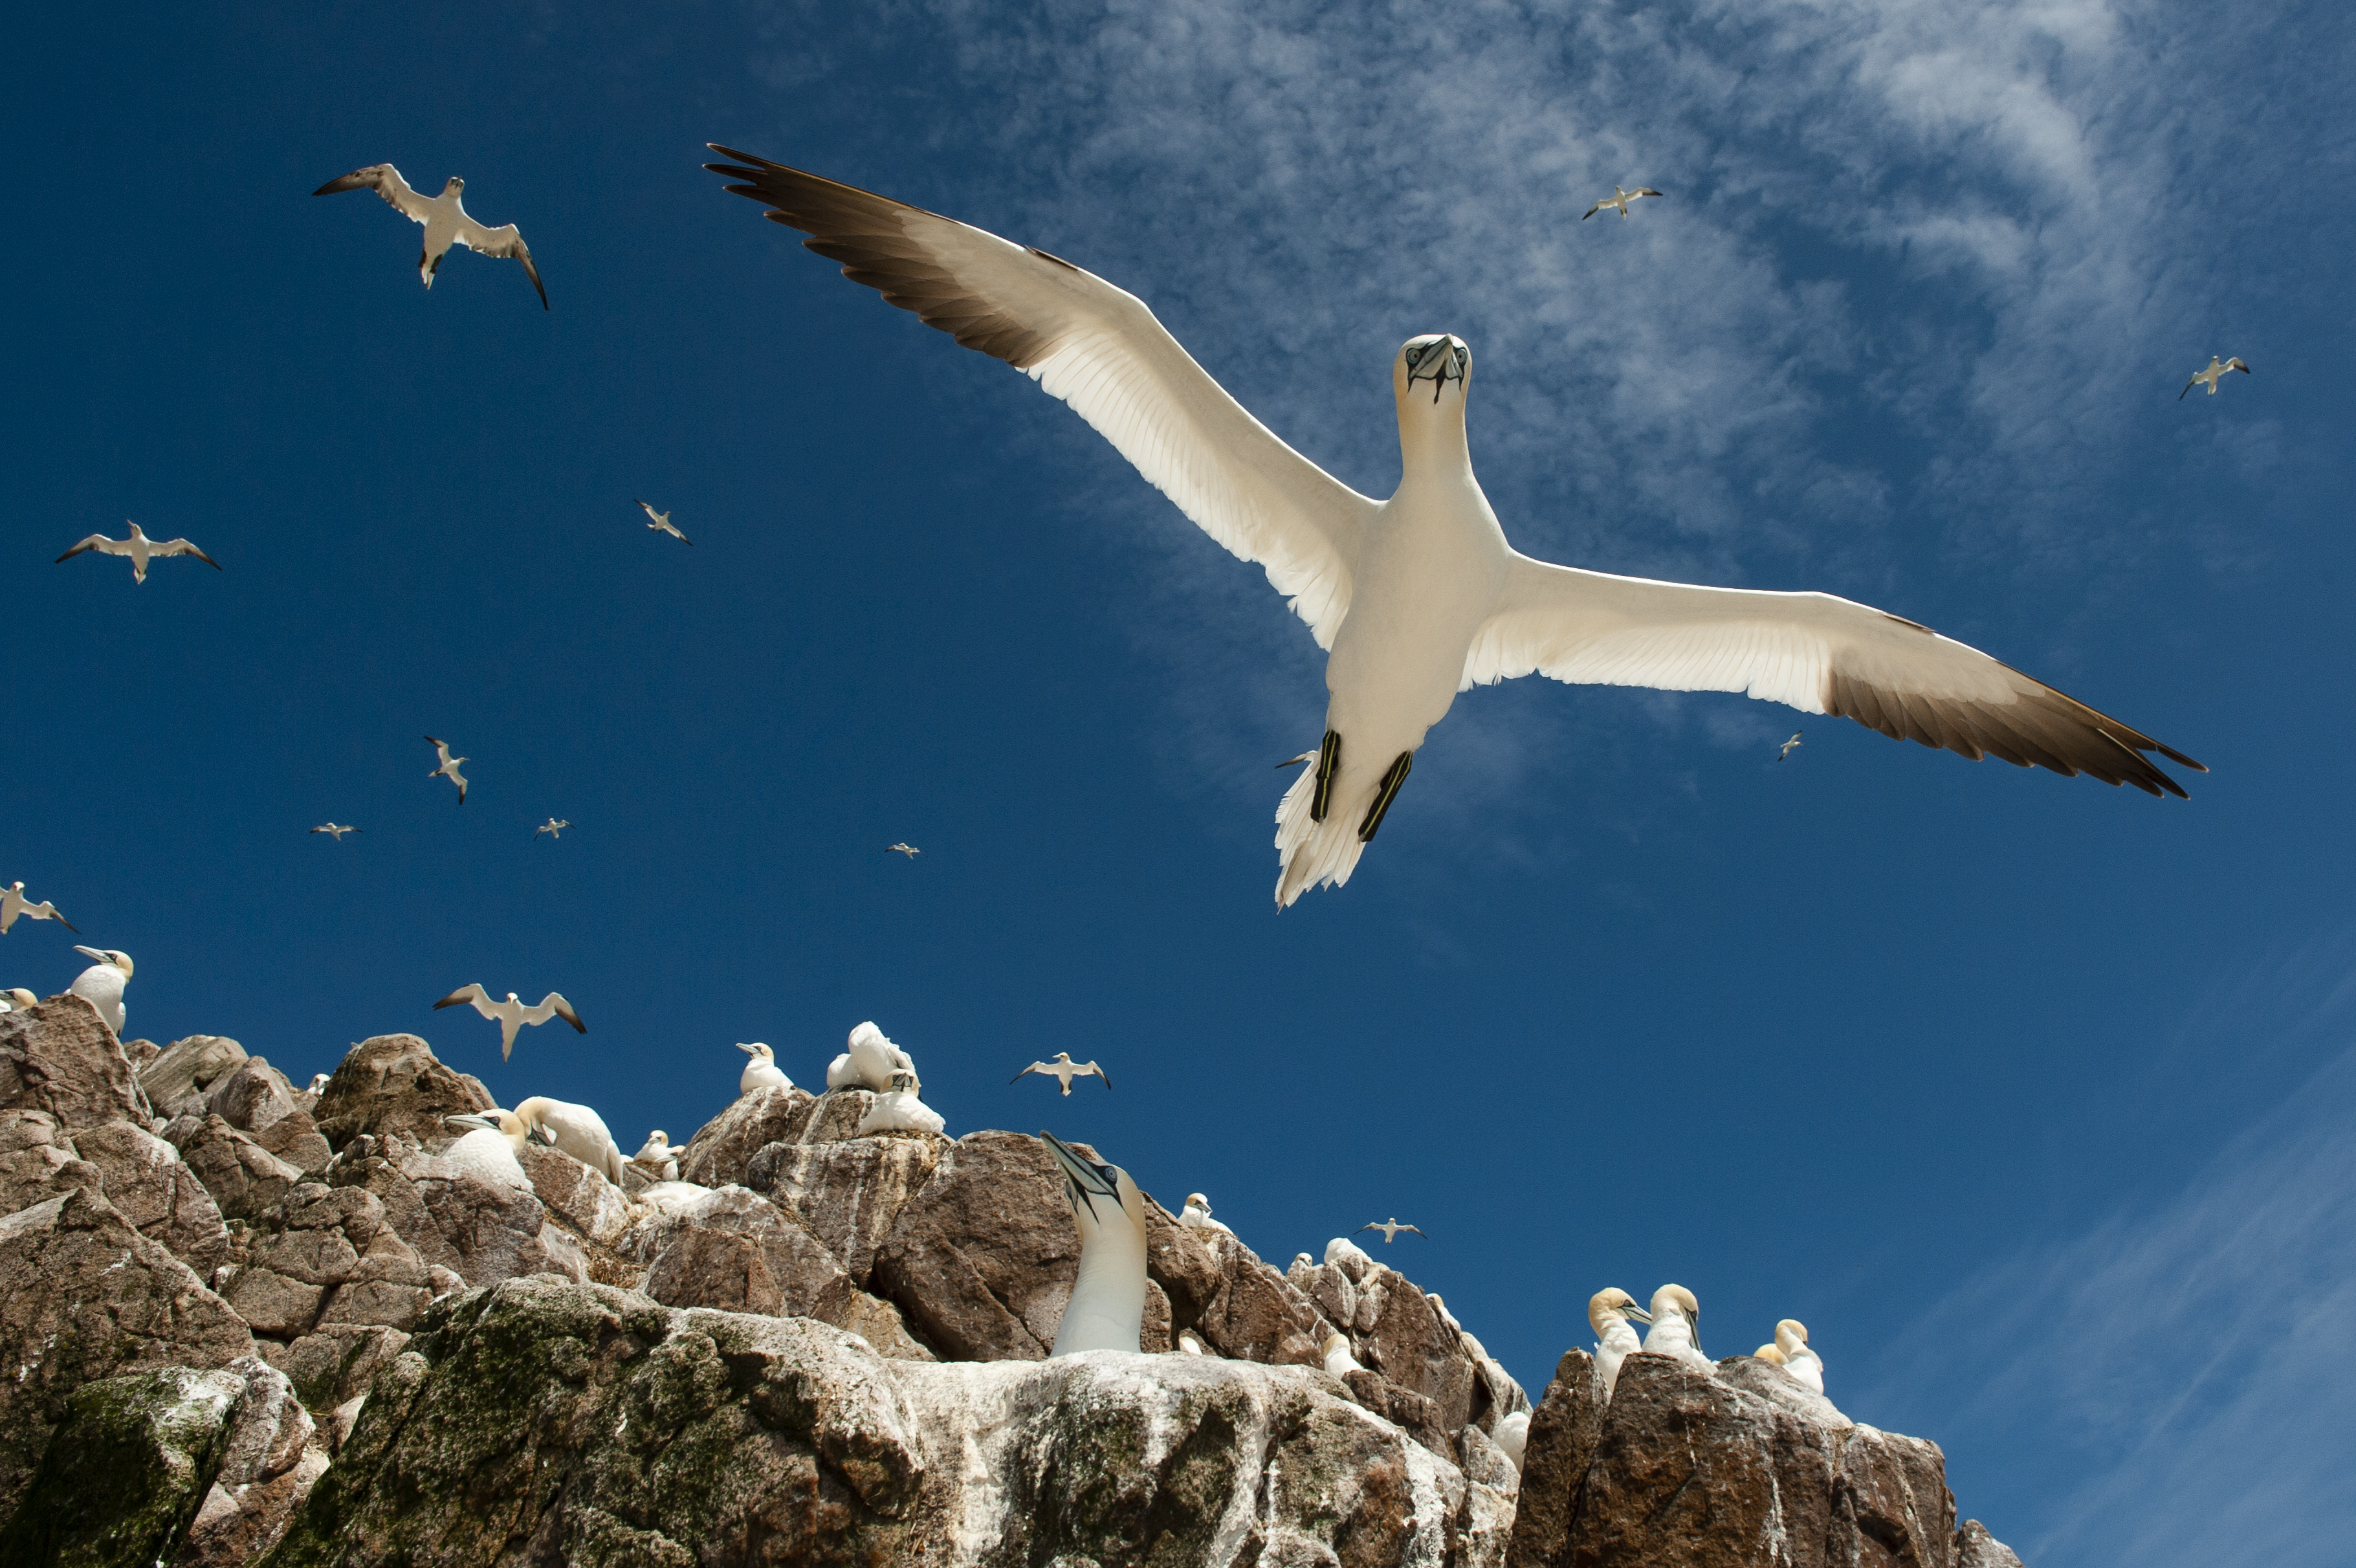 Birds in flight at the coast